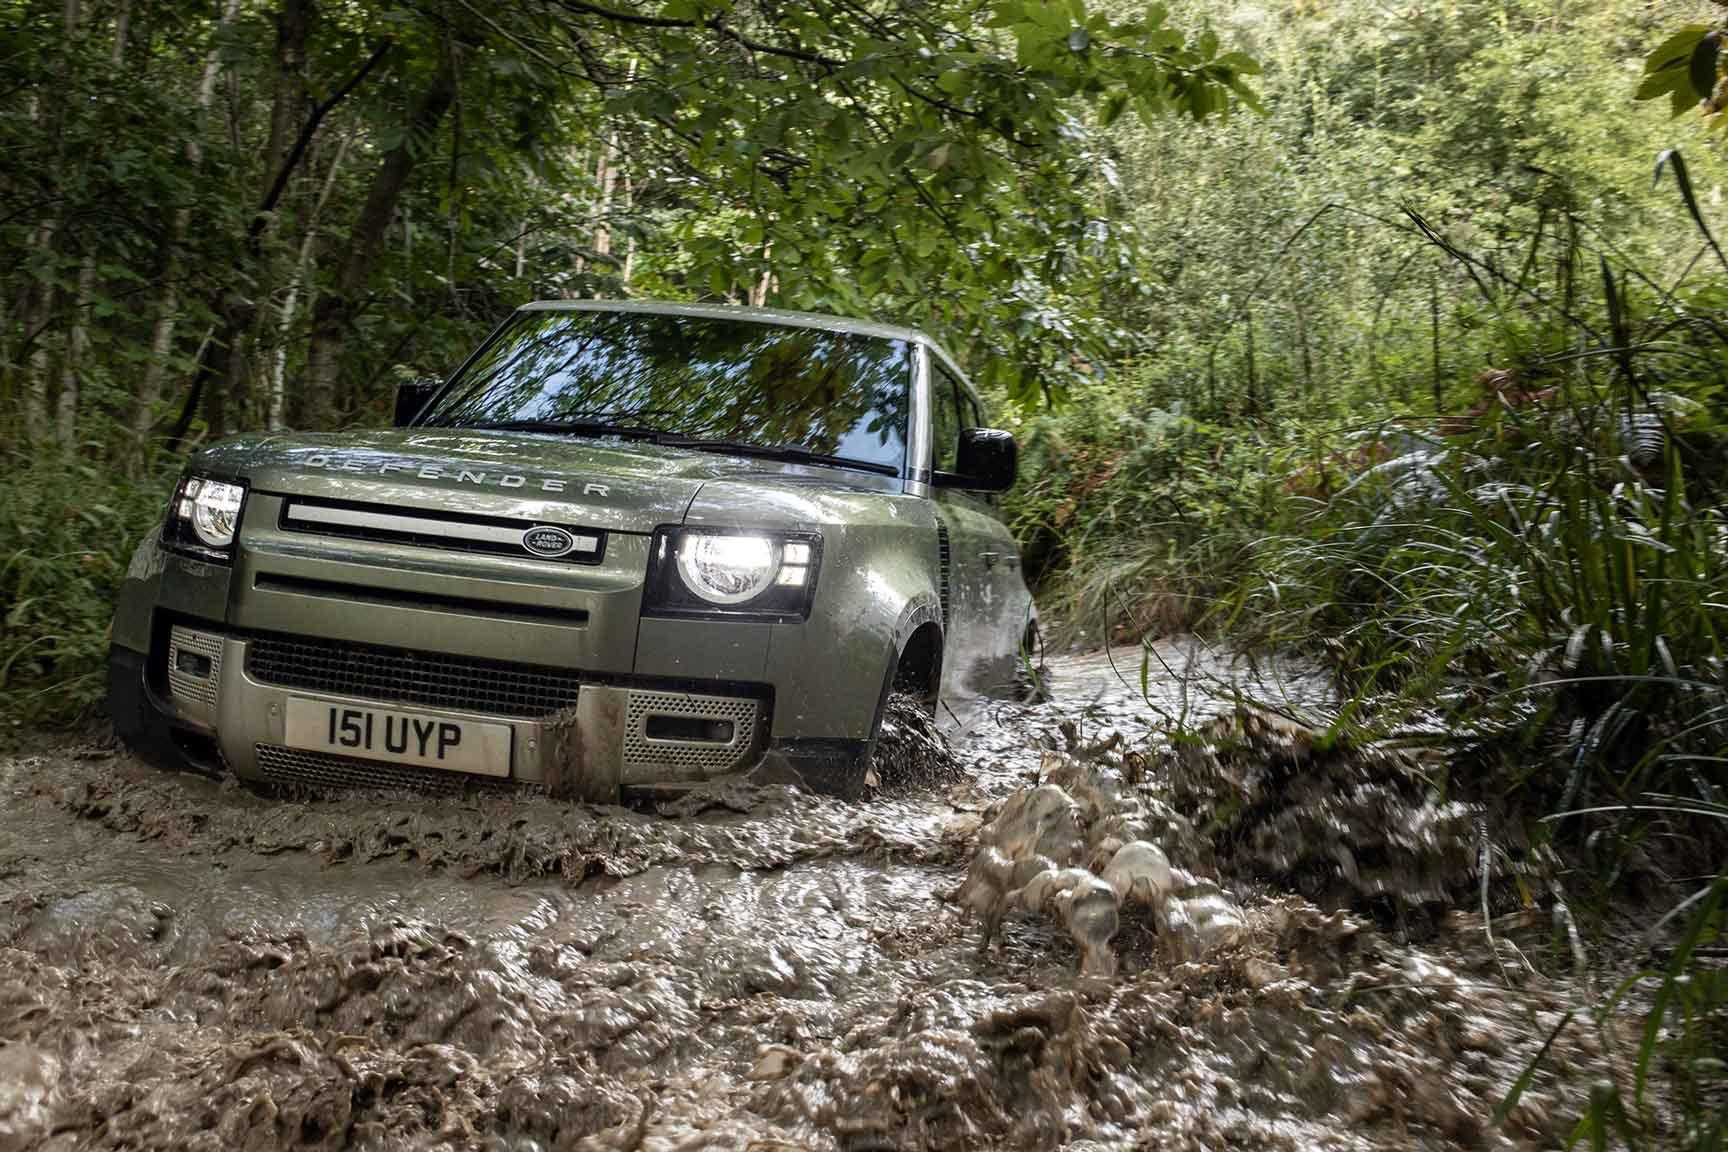 New Land Rover Defender plug-in hybrid wading